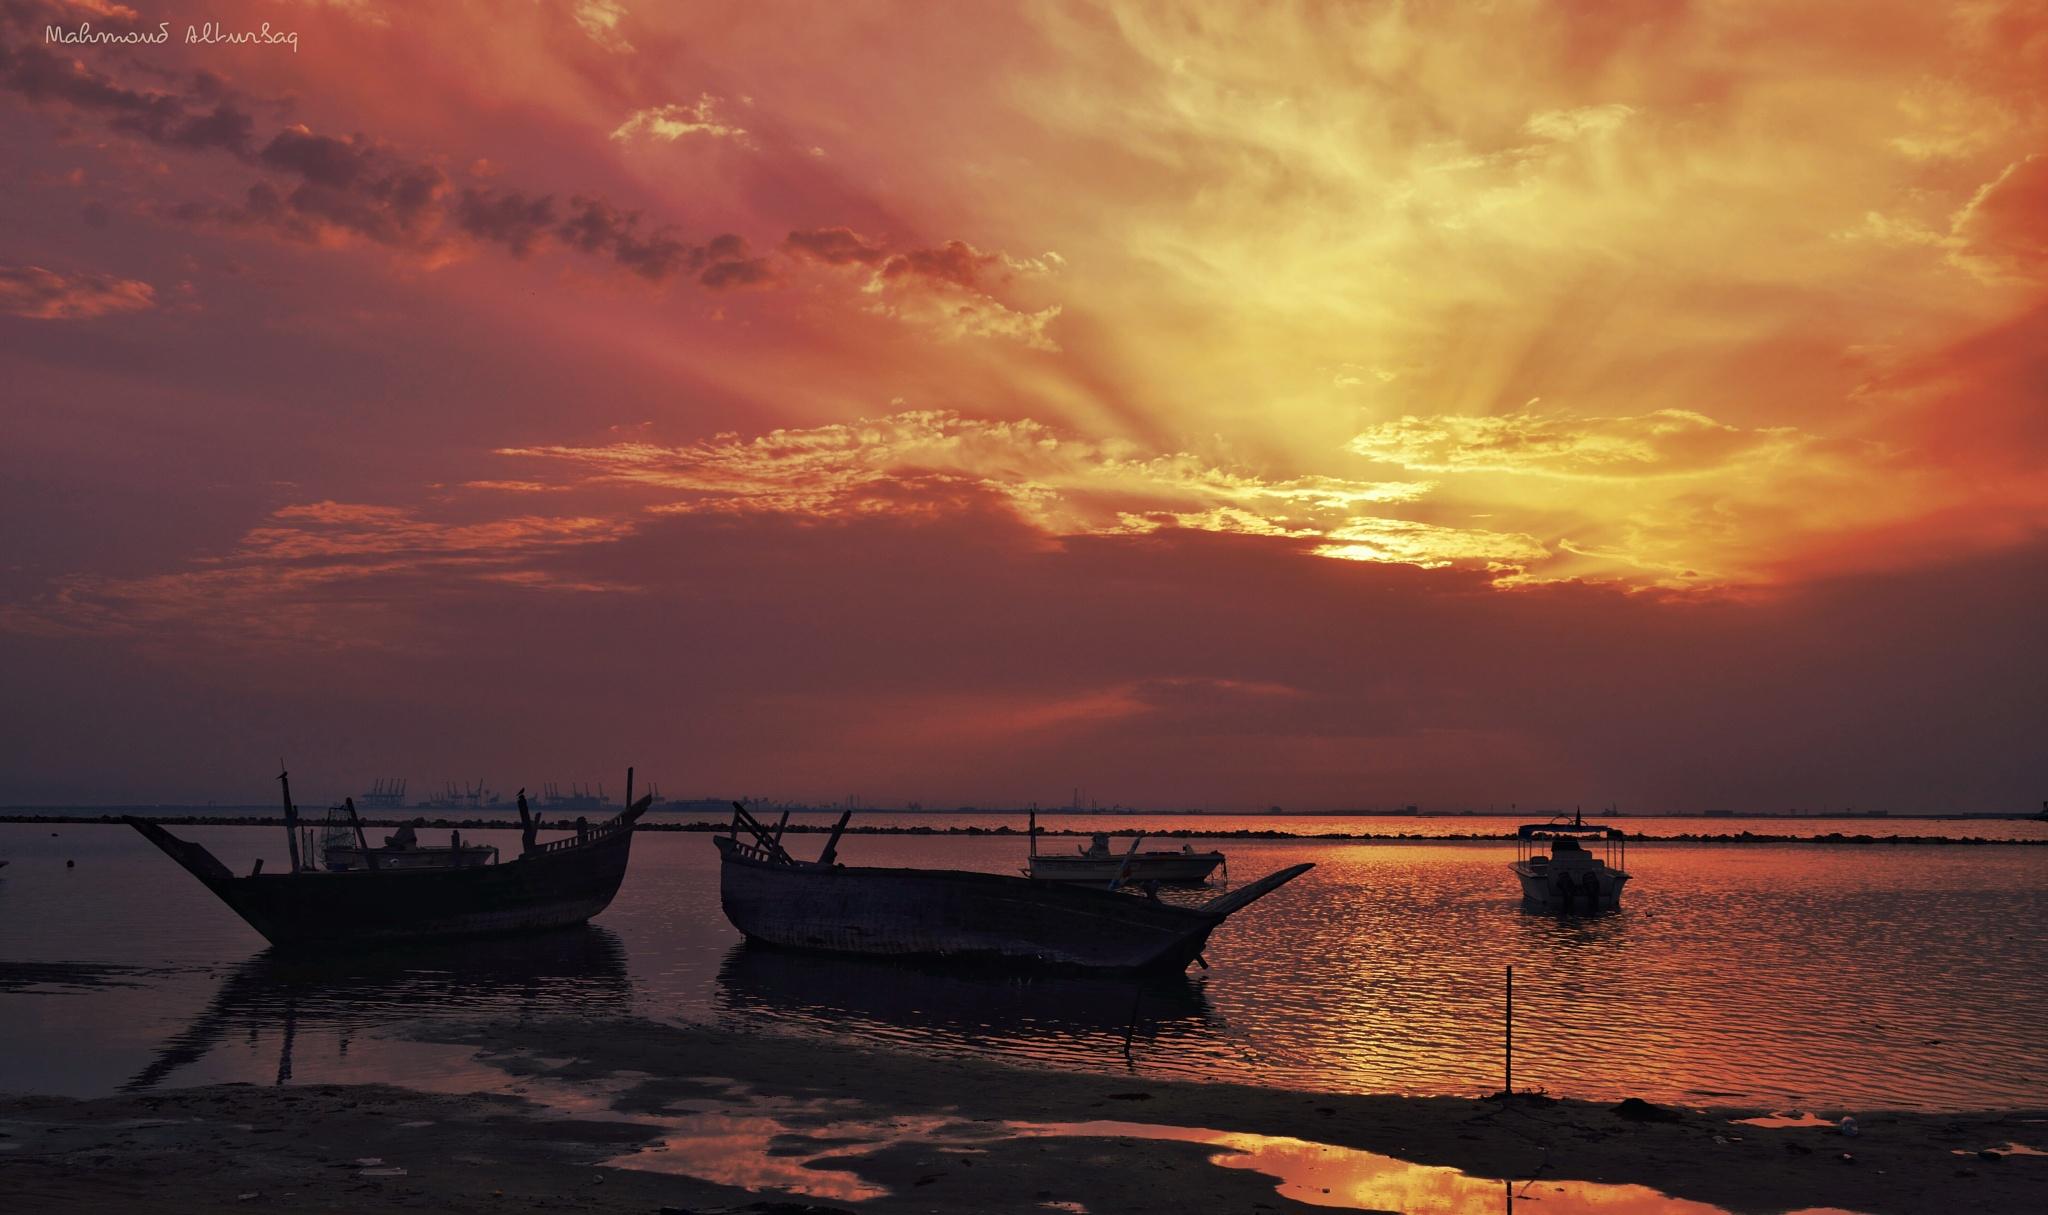 Amazing Sunrise by Mahmoud Alturbaq